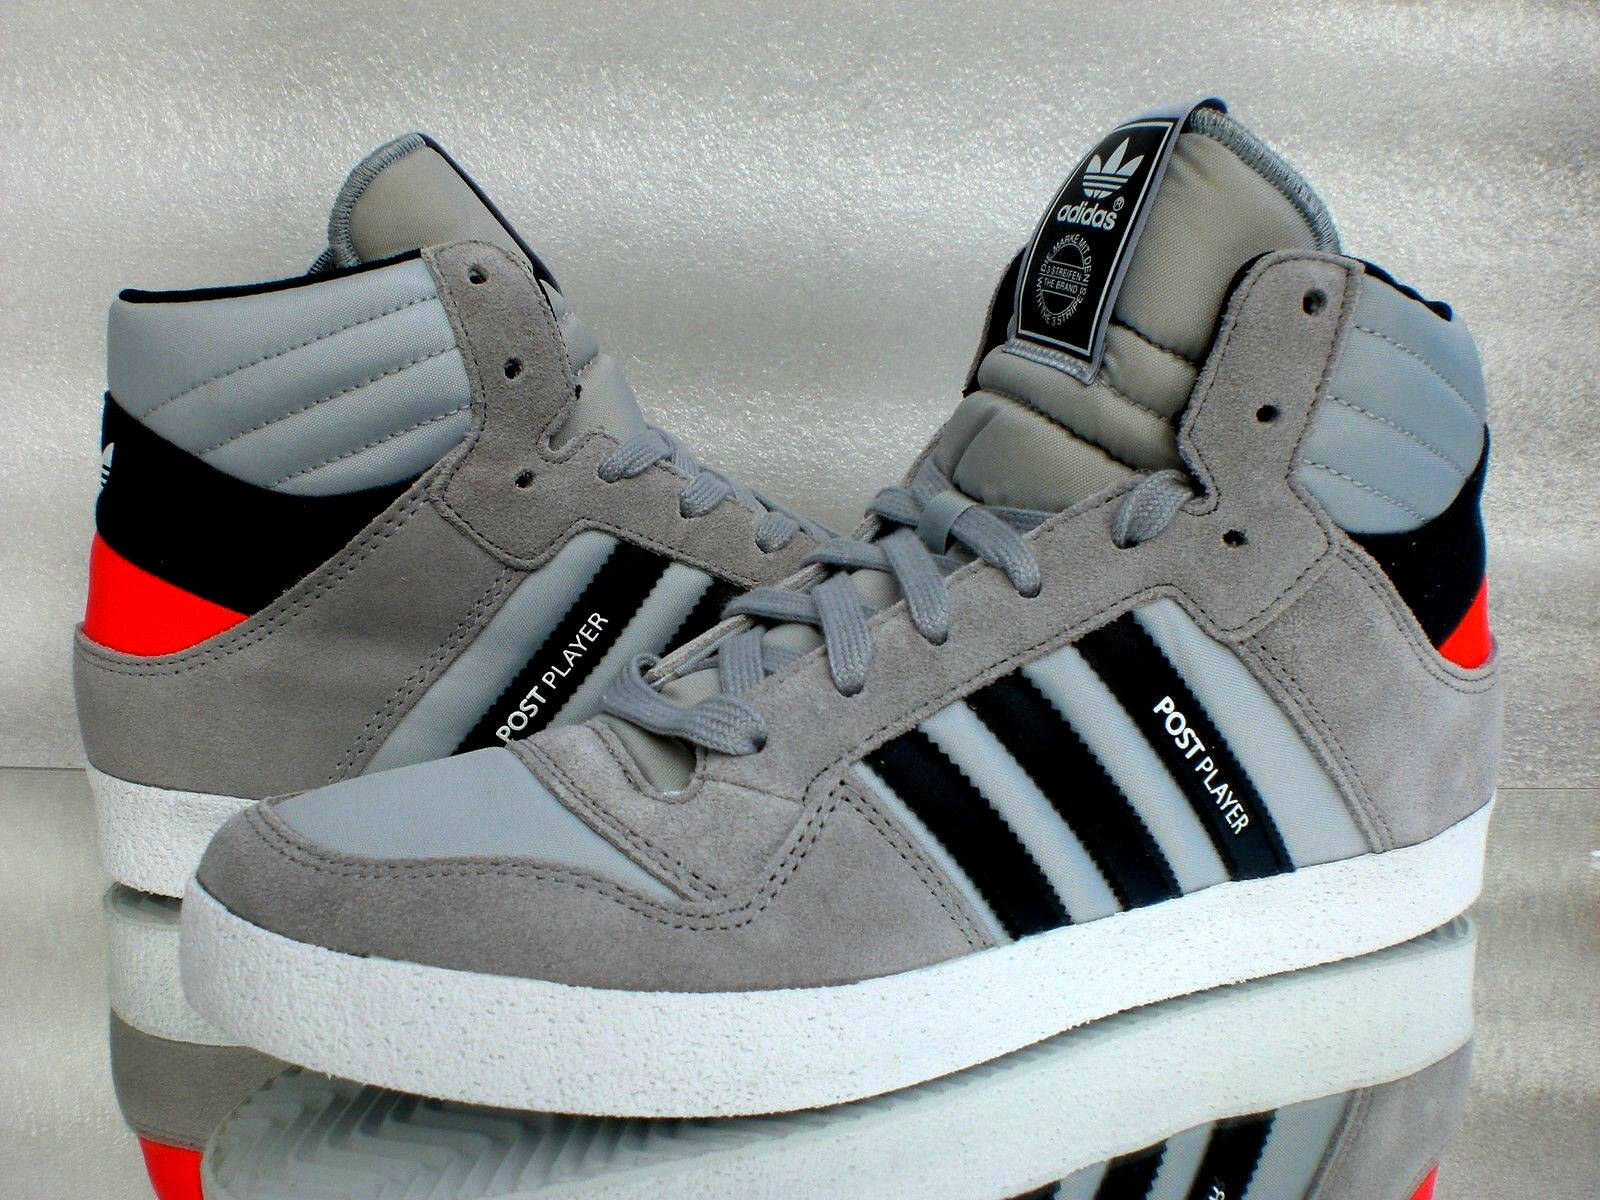 Adidas Originals POST PLAYER VULC Neu TurnschuheSneaker Leder/Textil grau G95186 Neu VULC 21c851